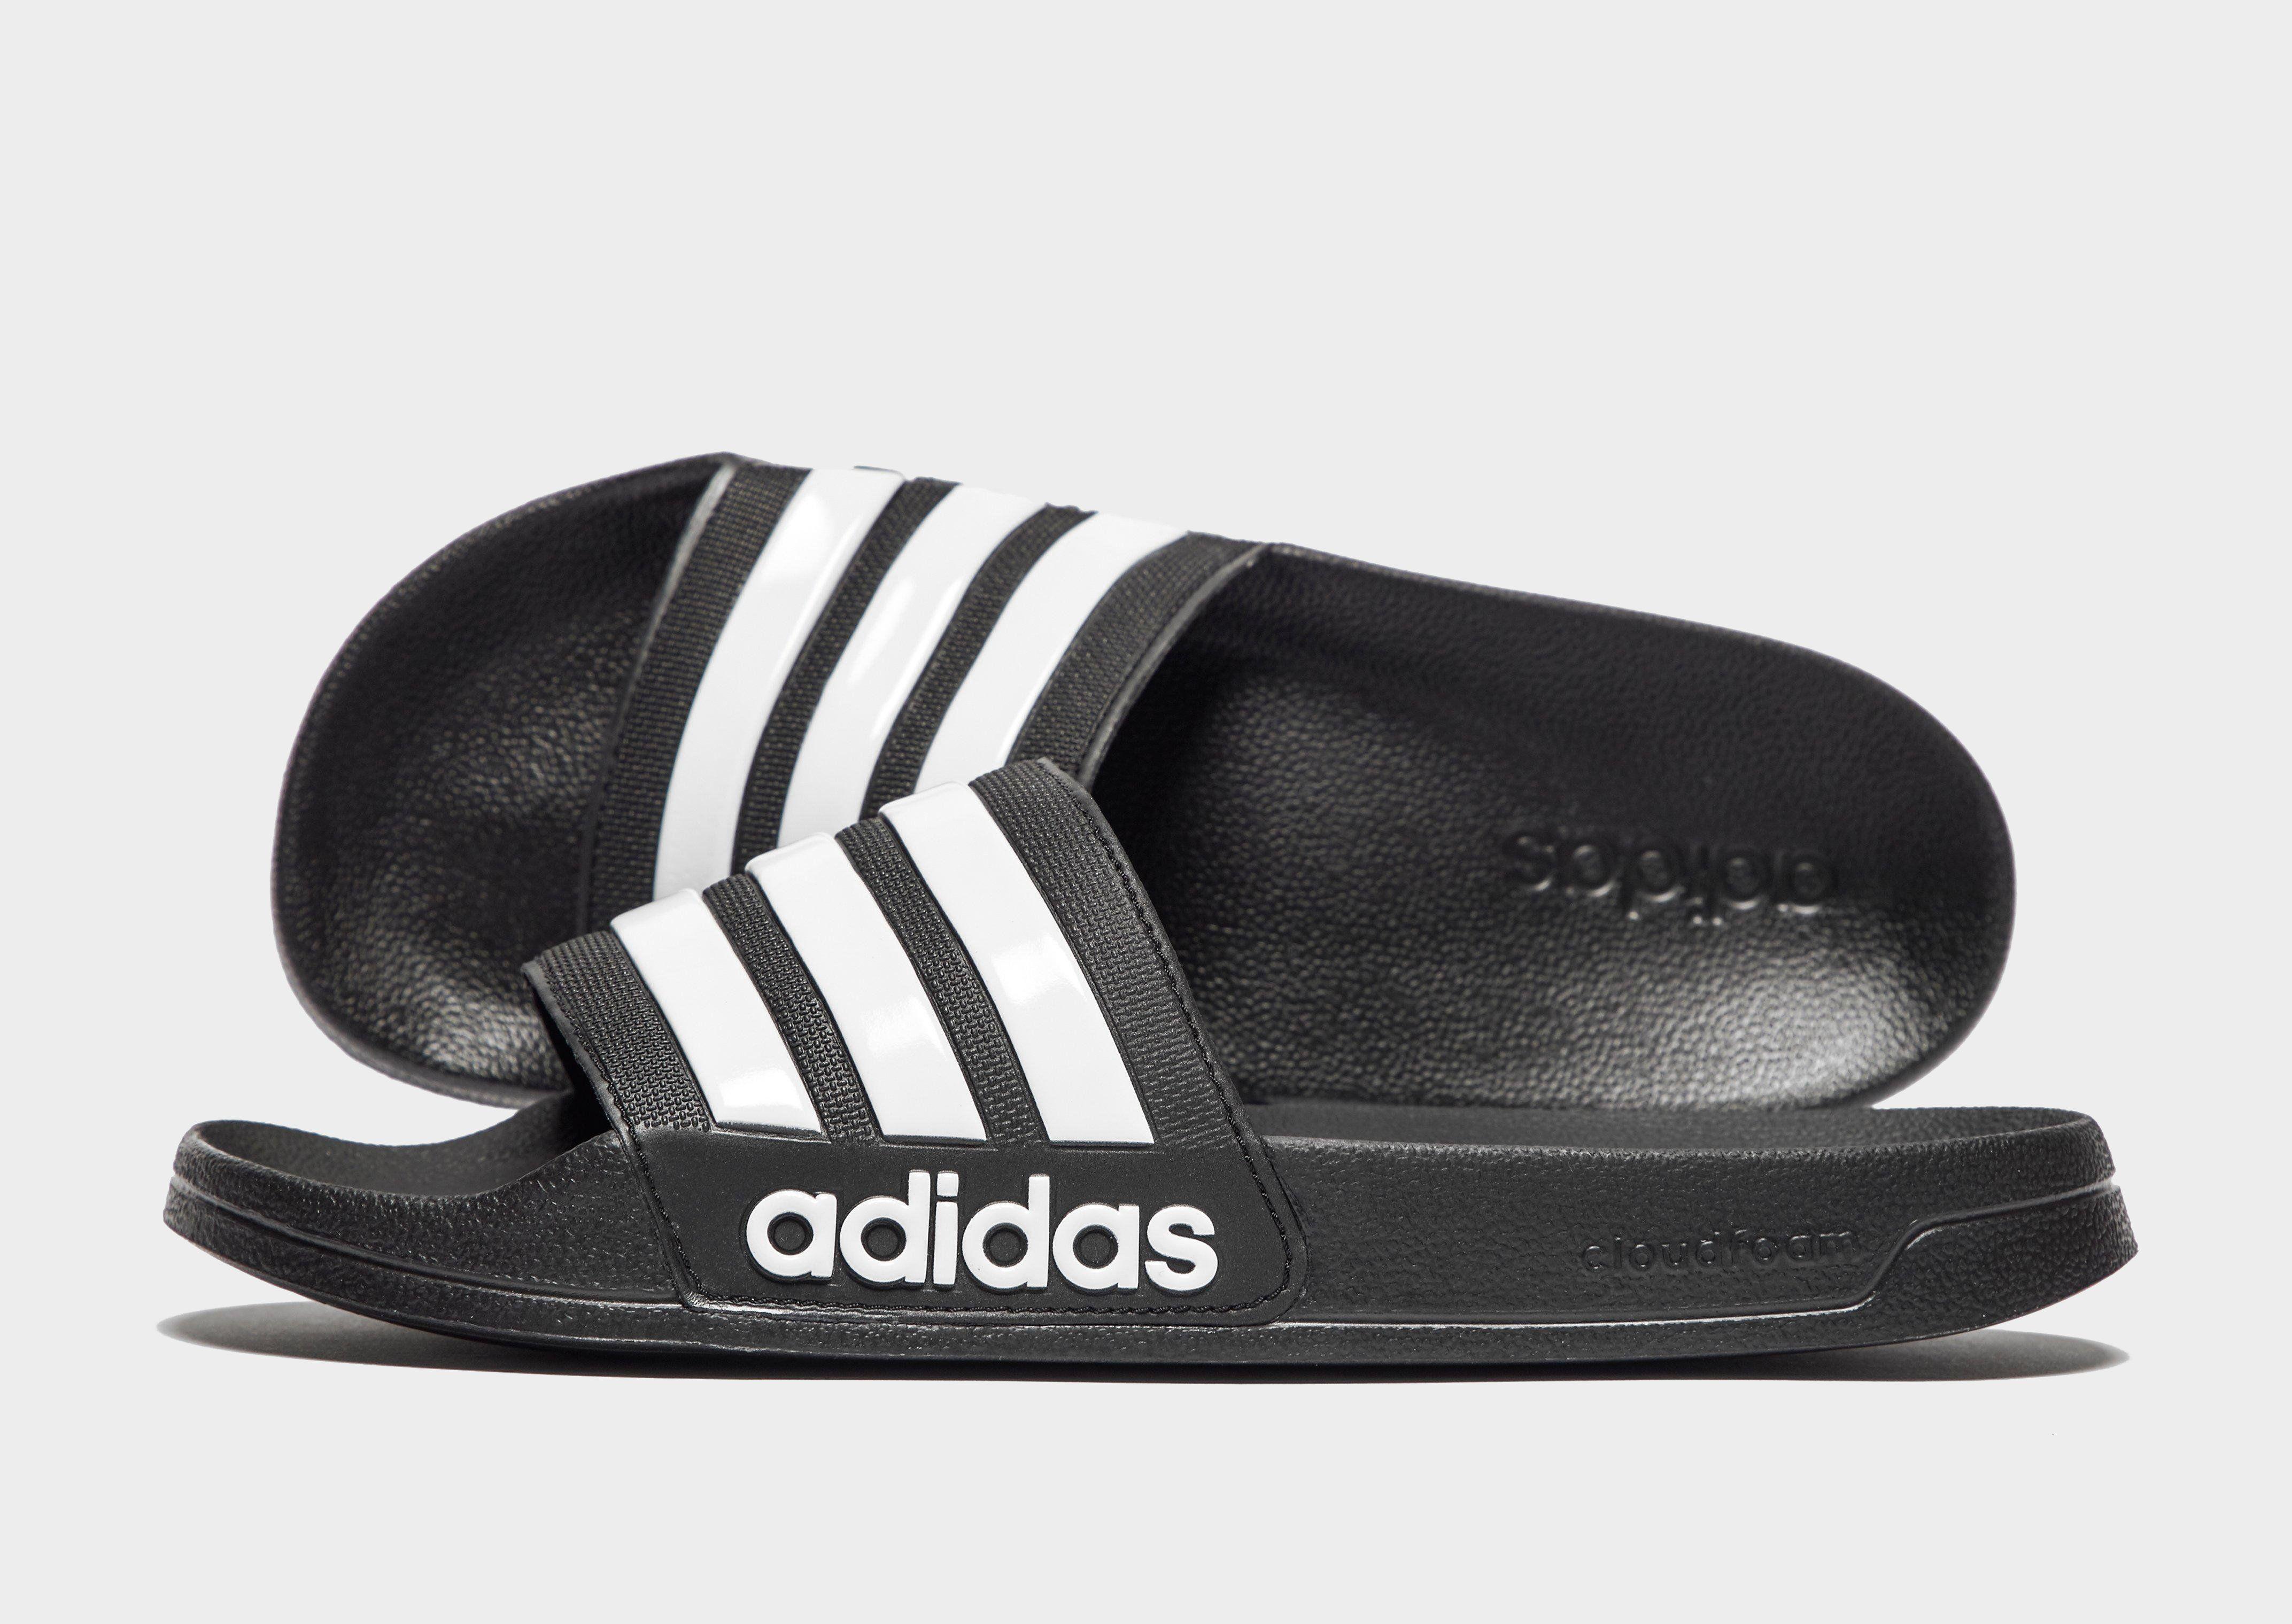 big sale 01e92 60597 adidas Cloudfoam Adilette Sandal Herre  JD Sports